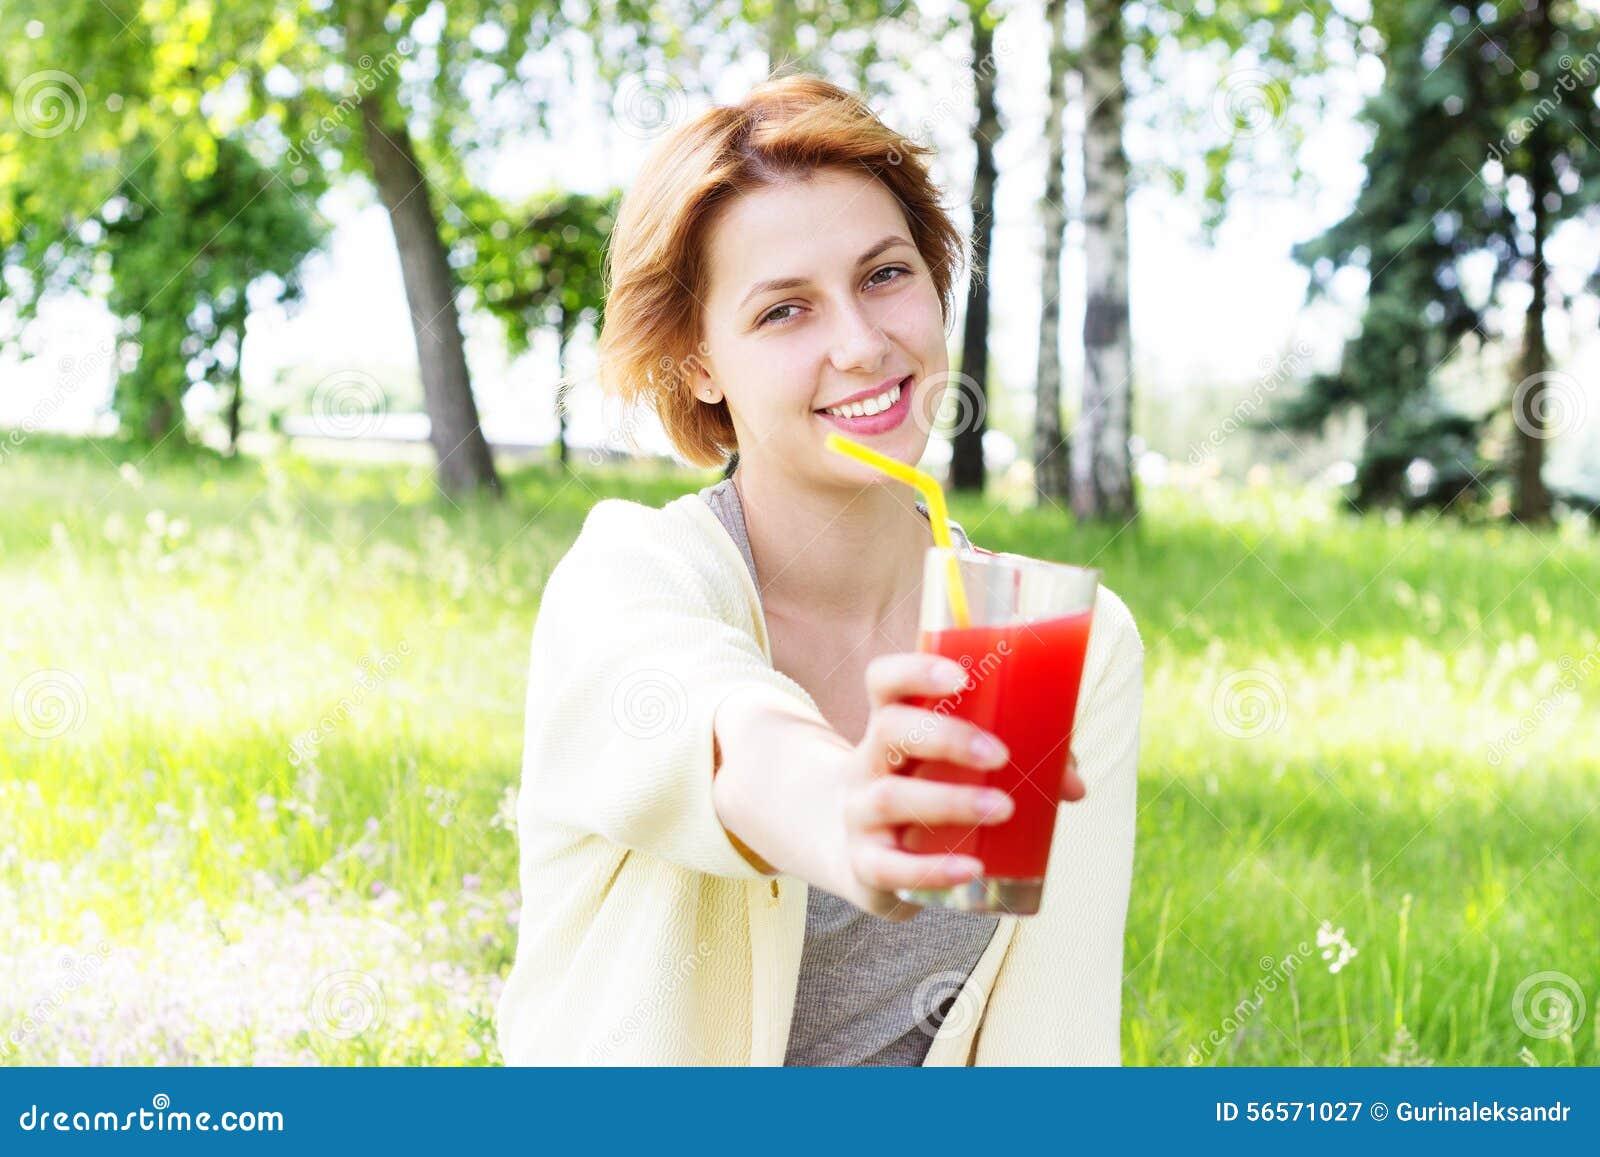 Download Το χαμογελώντας κορίτσι πίνει το χυμό Στοκ Εικόνα - εικόνα από άνετος, έθνος: 56571027